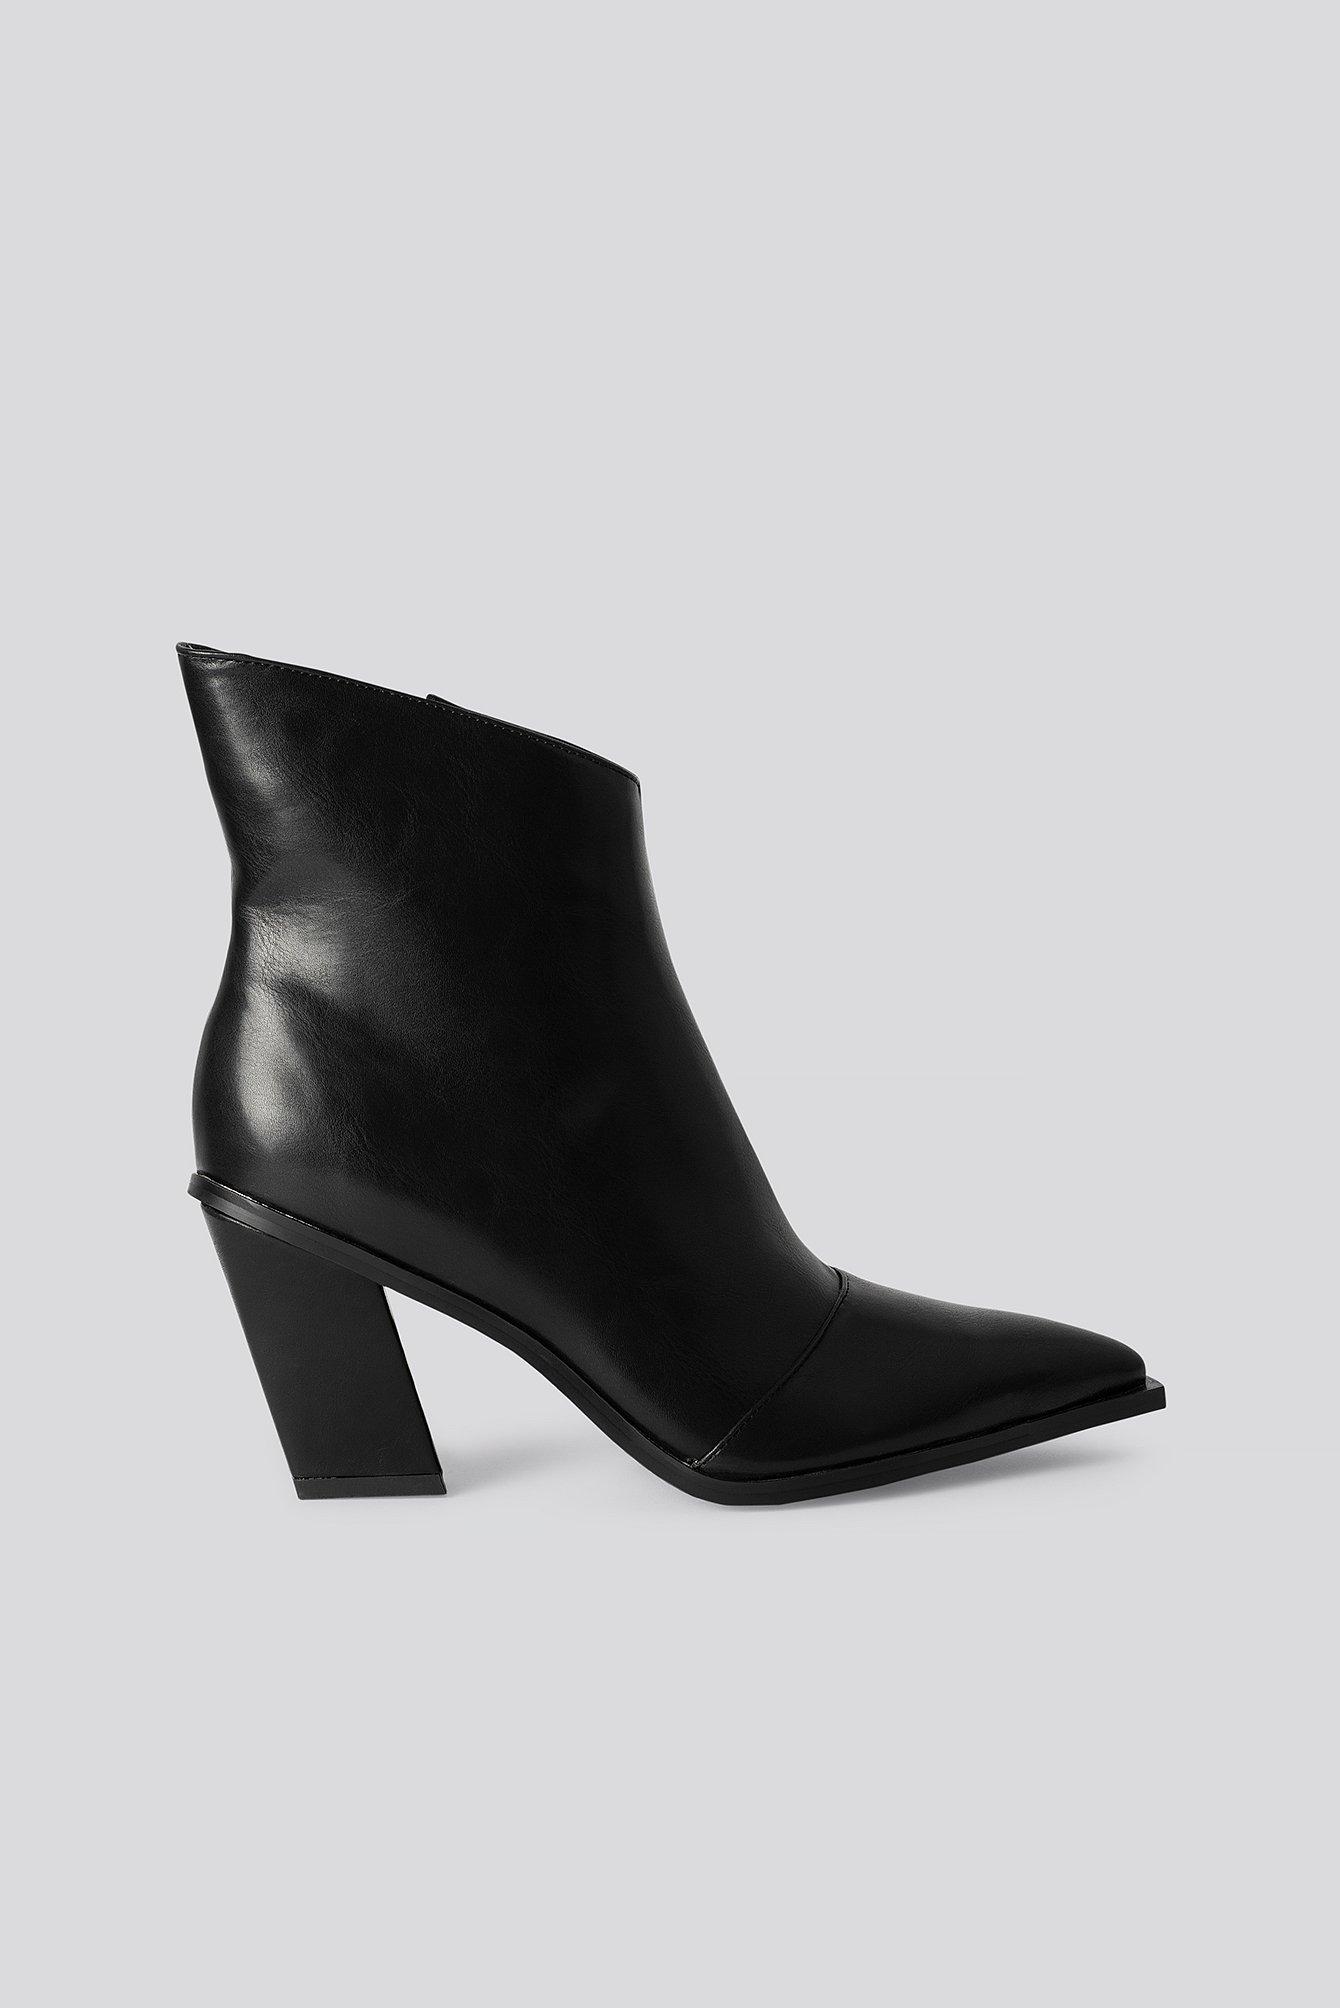 na-kd shoes -  Slanted Heel Toe Detail Boots - Black